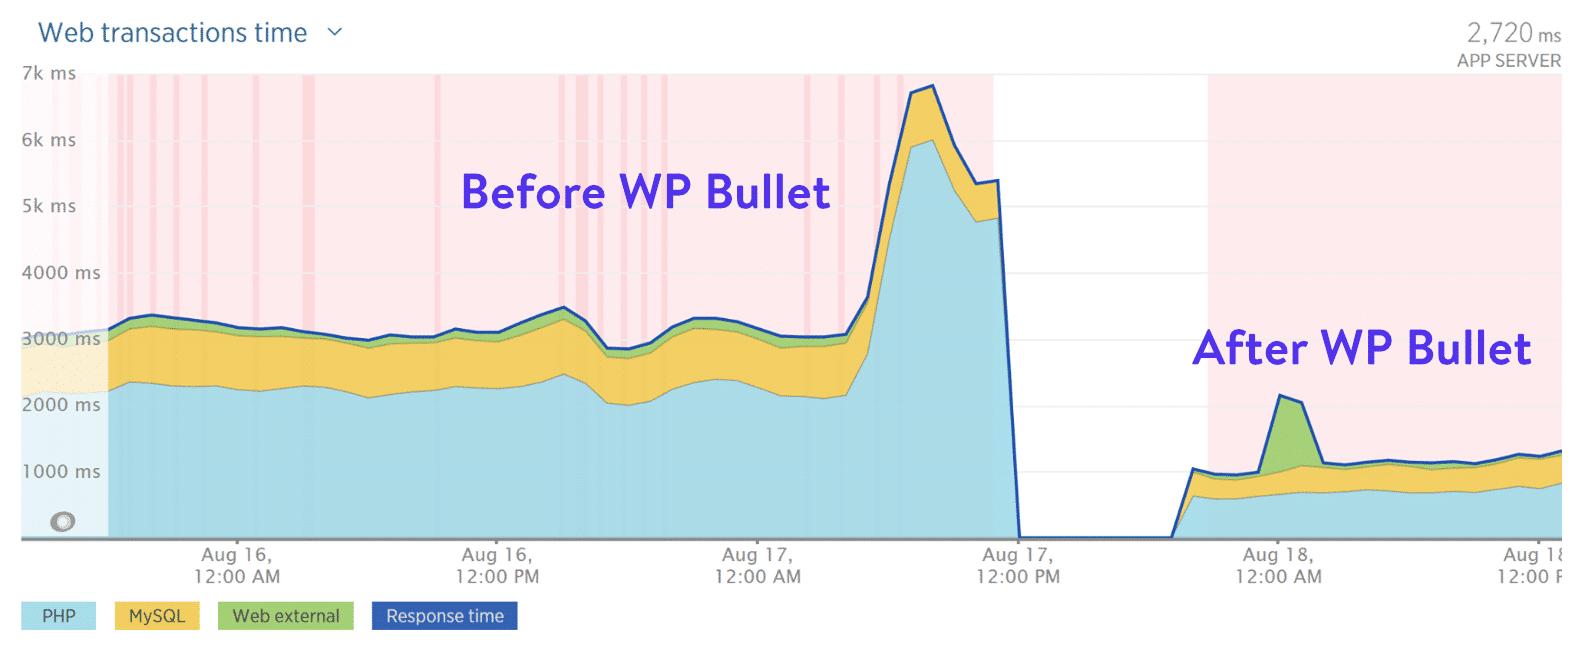 WP Bullet: ennen ja jälkeen